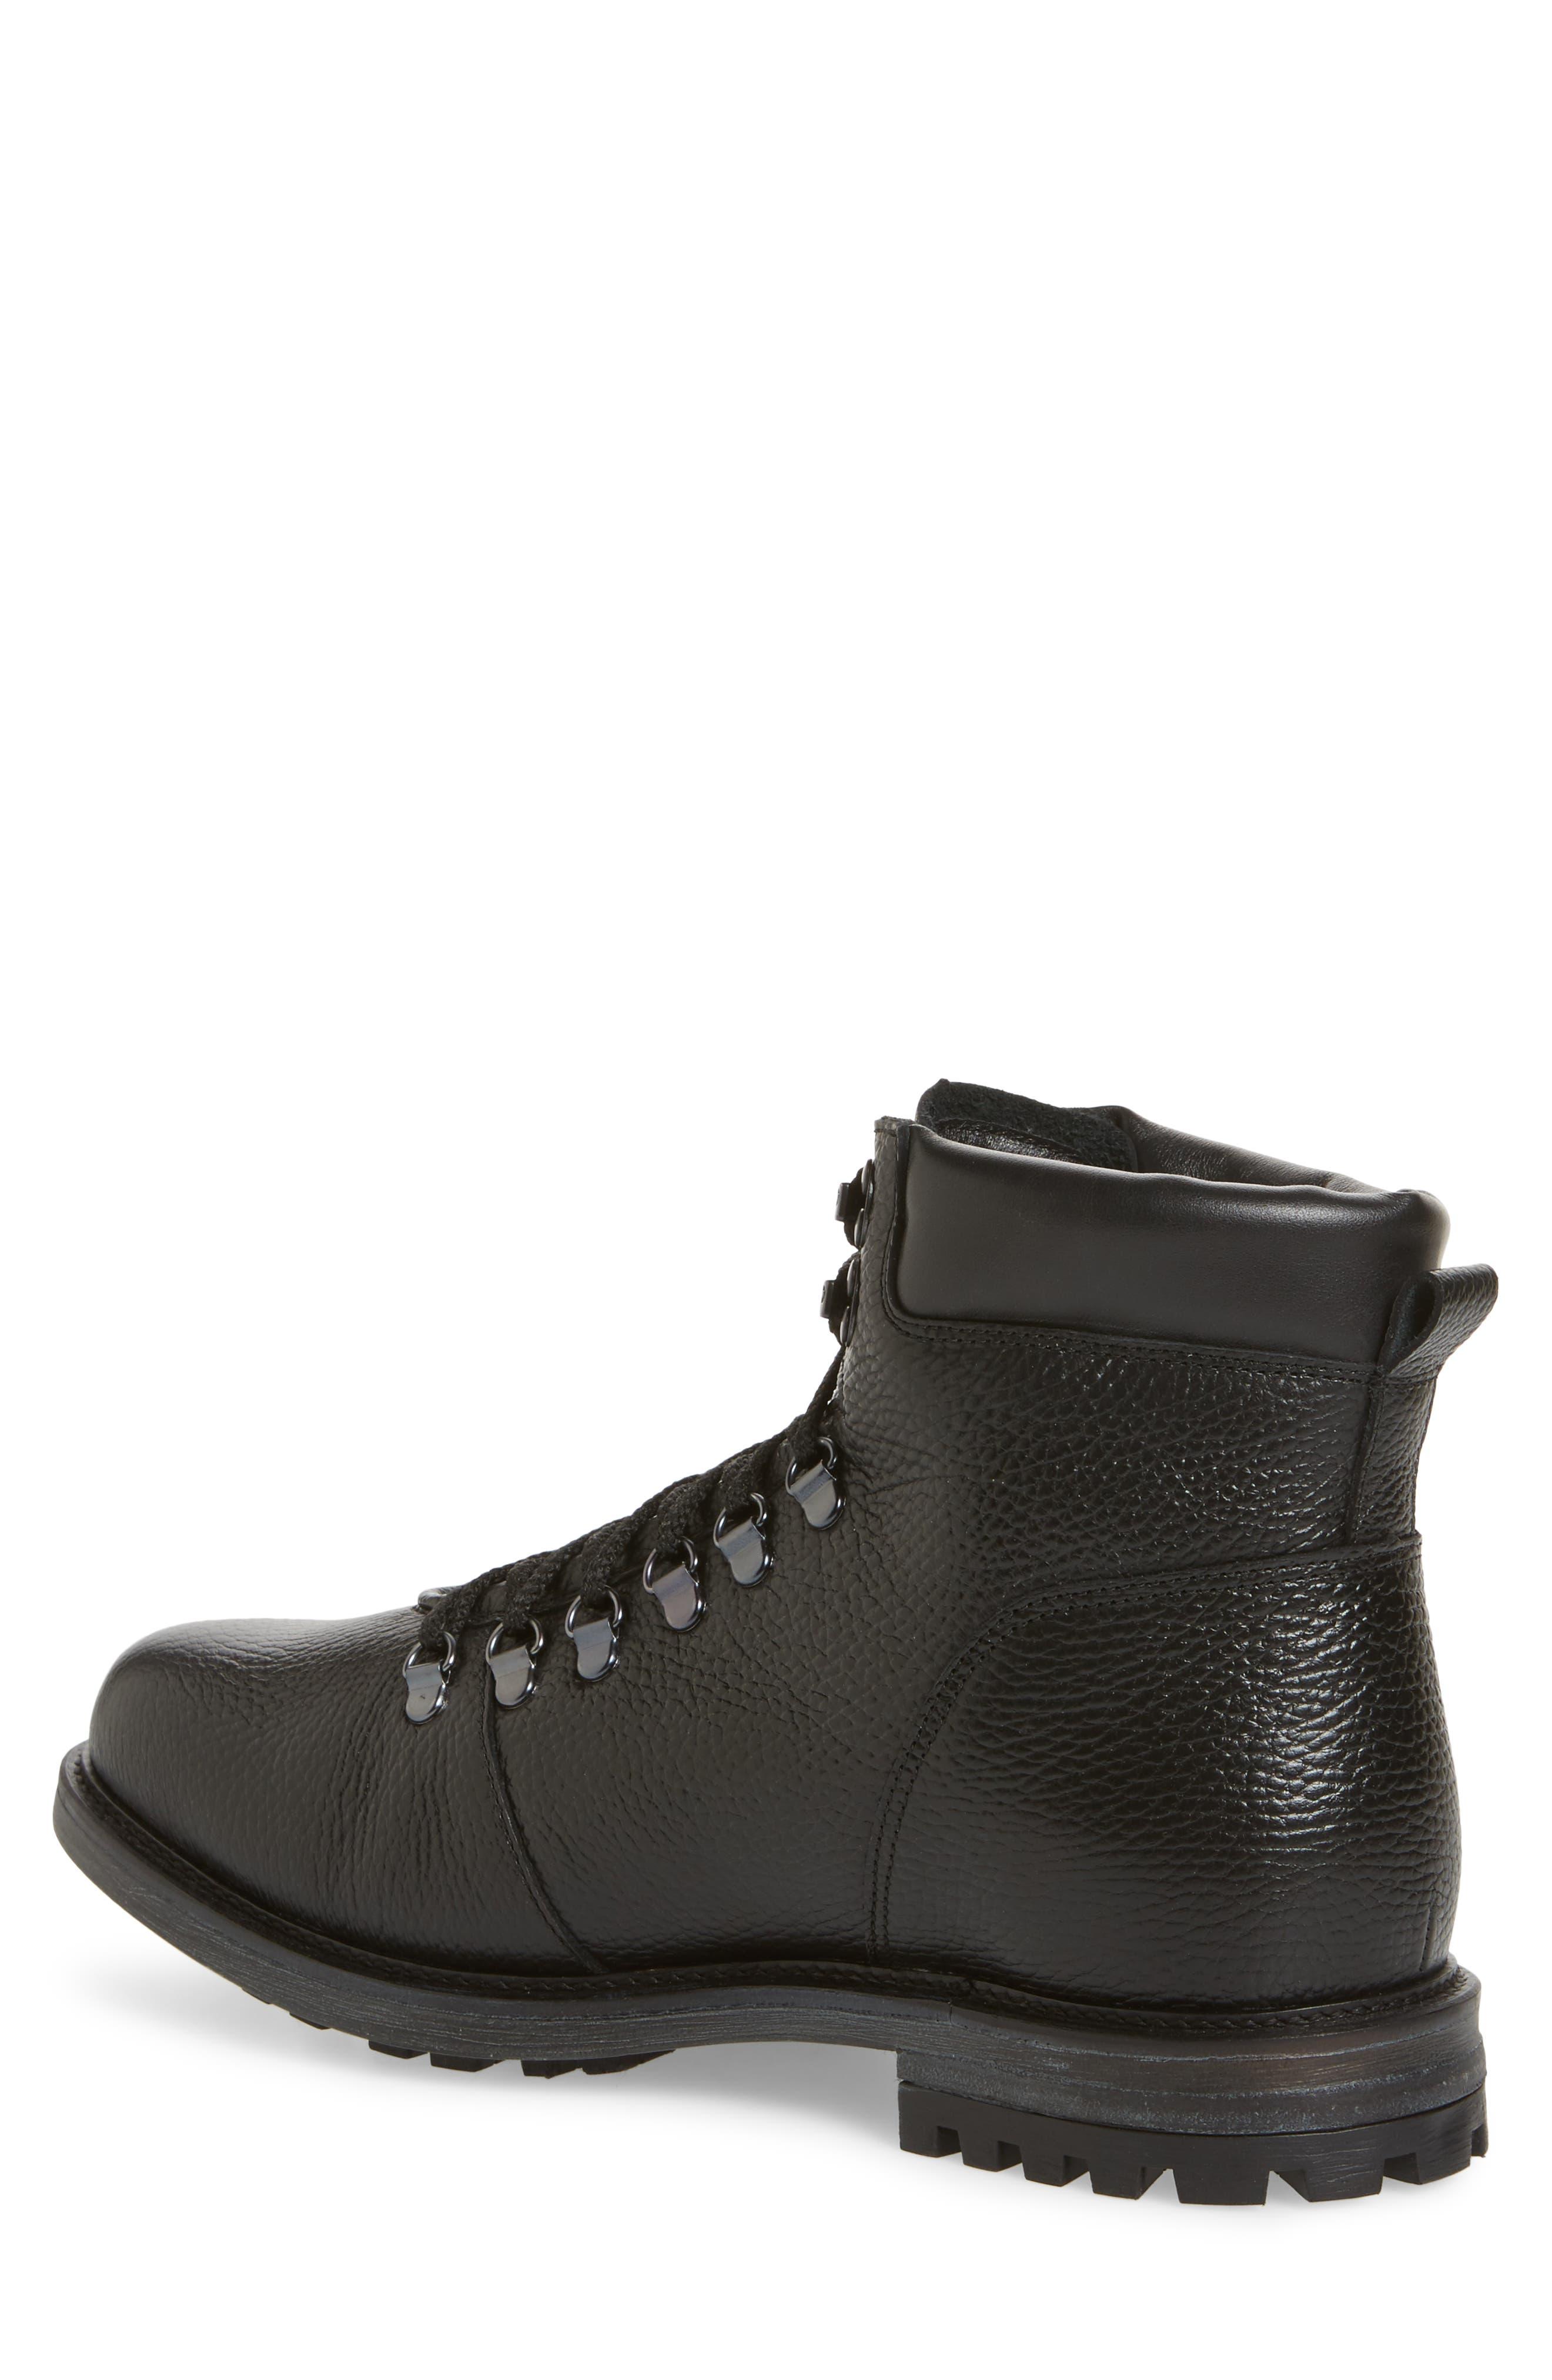 Venice Genuine Shearling Lined Plain Toe Boot,                             Alternate thumbnail 2, color,                             BLACK LEATHER